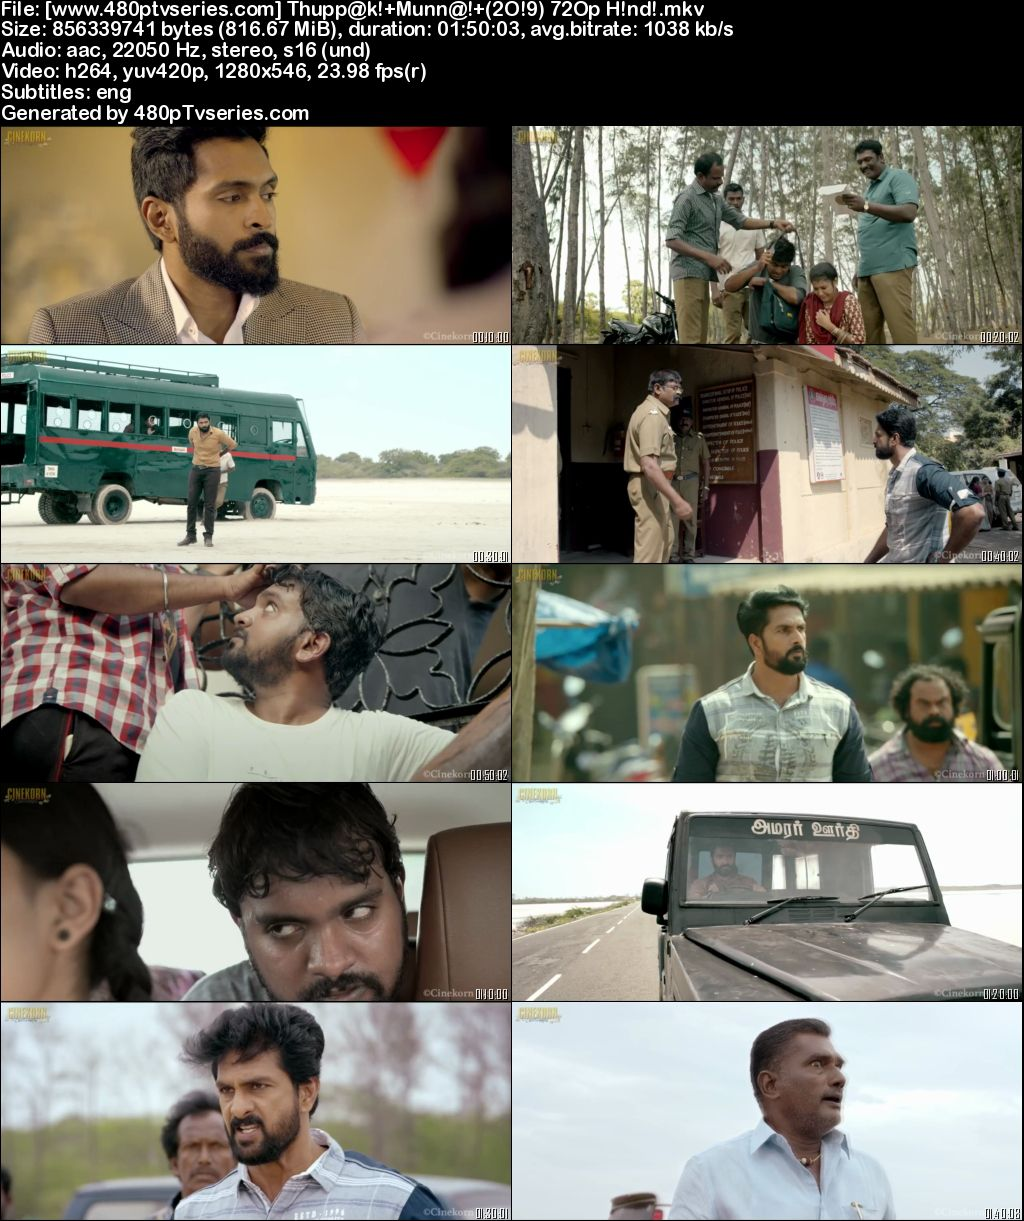 Thuppaki Munai (2019) Full Hindi Dubbed Movie Download 480p 720p HDRip Free Watch Online Full Movie Download Worldfree4u 9xmovies